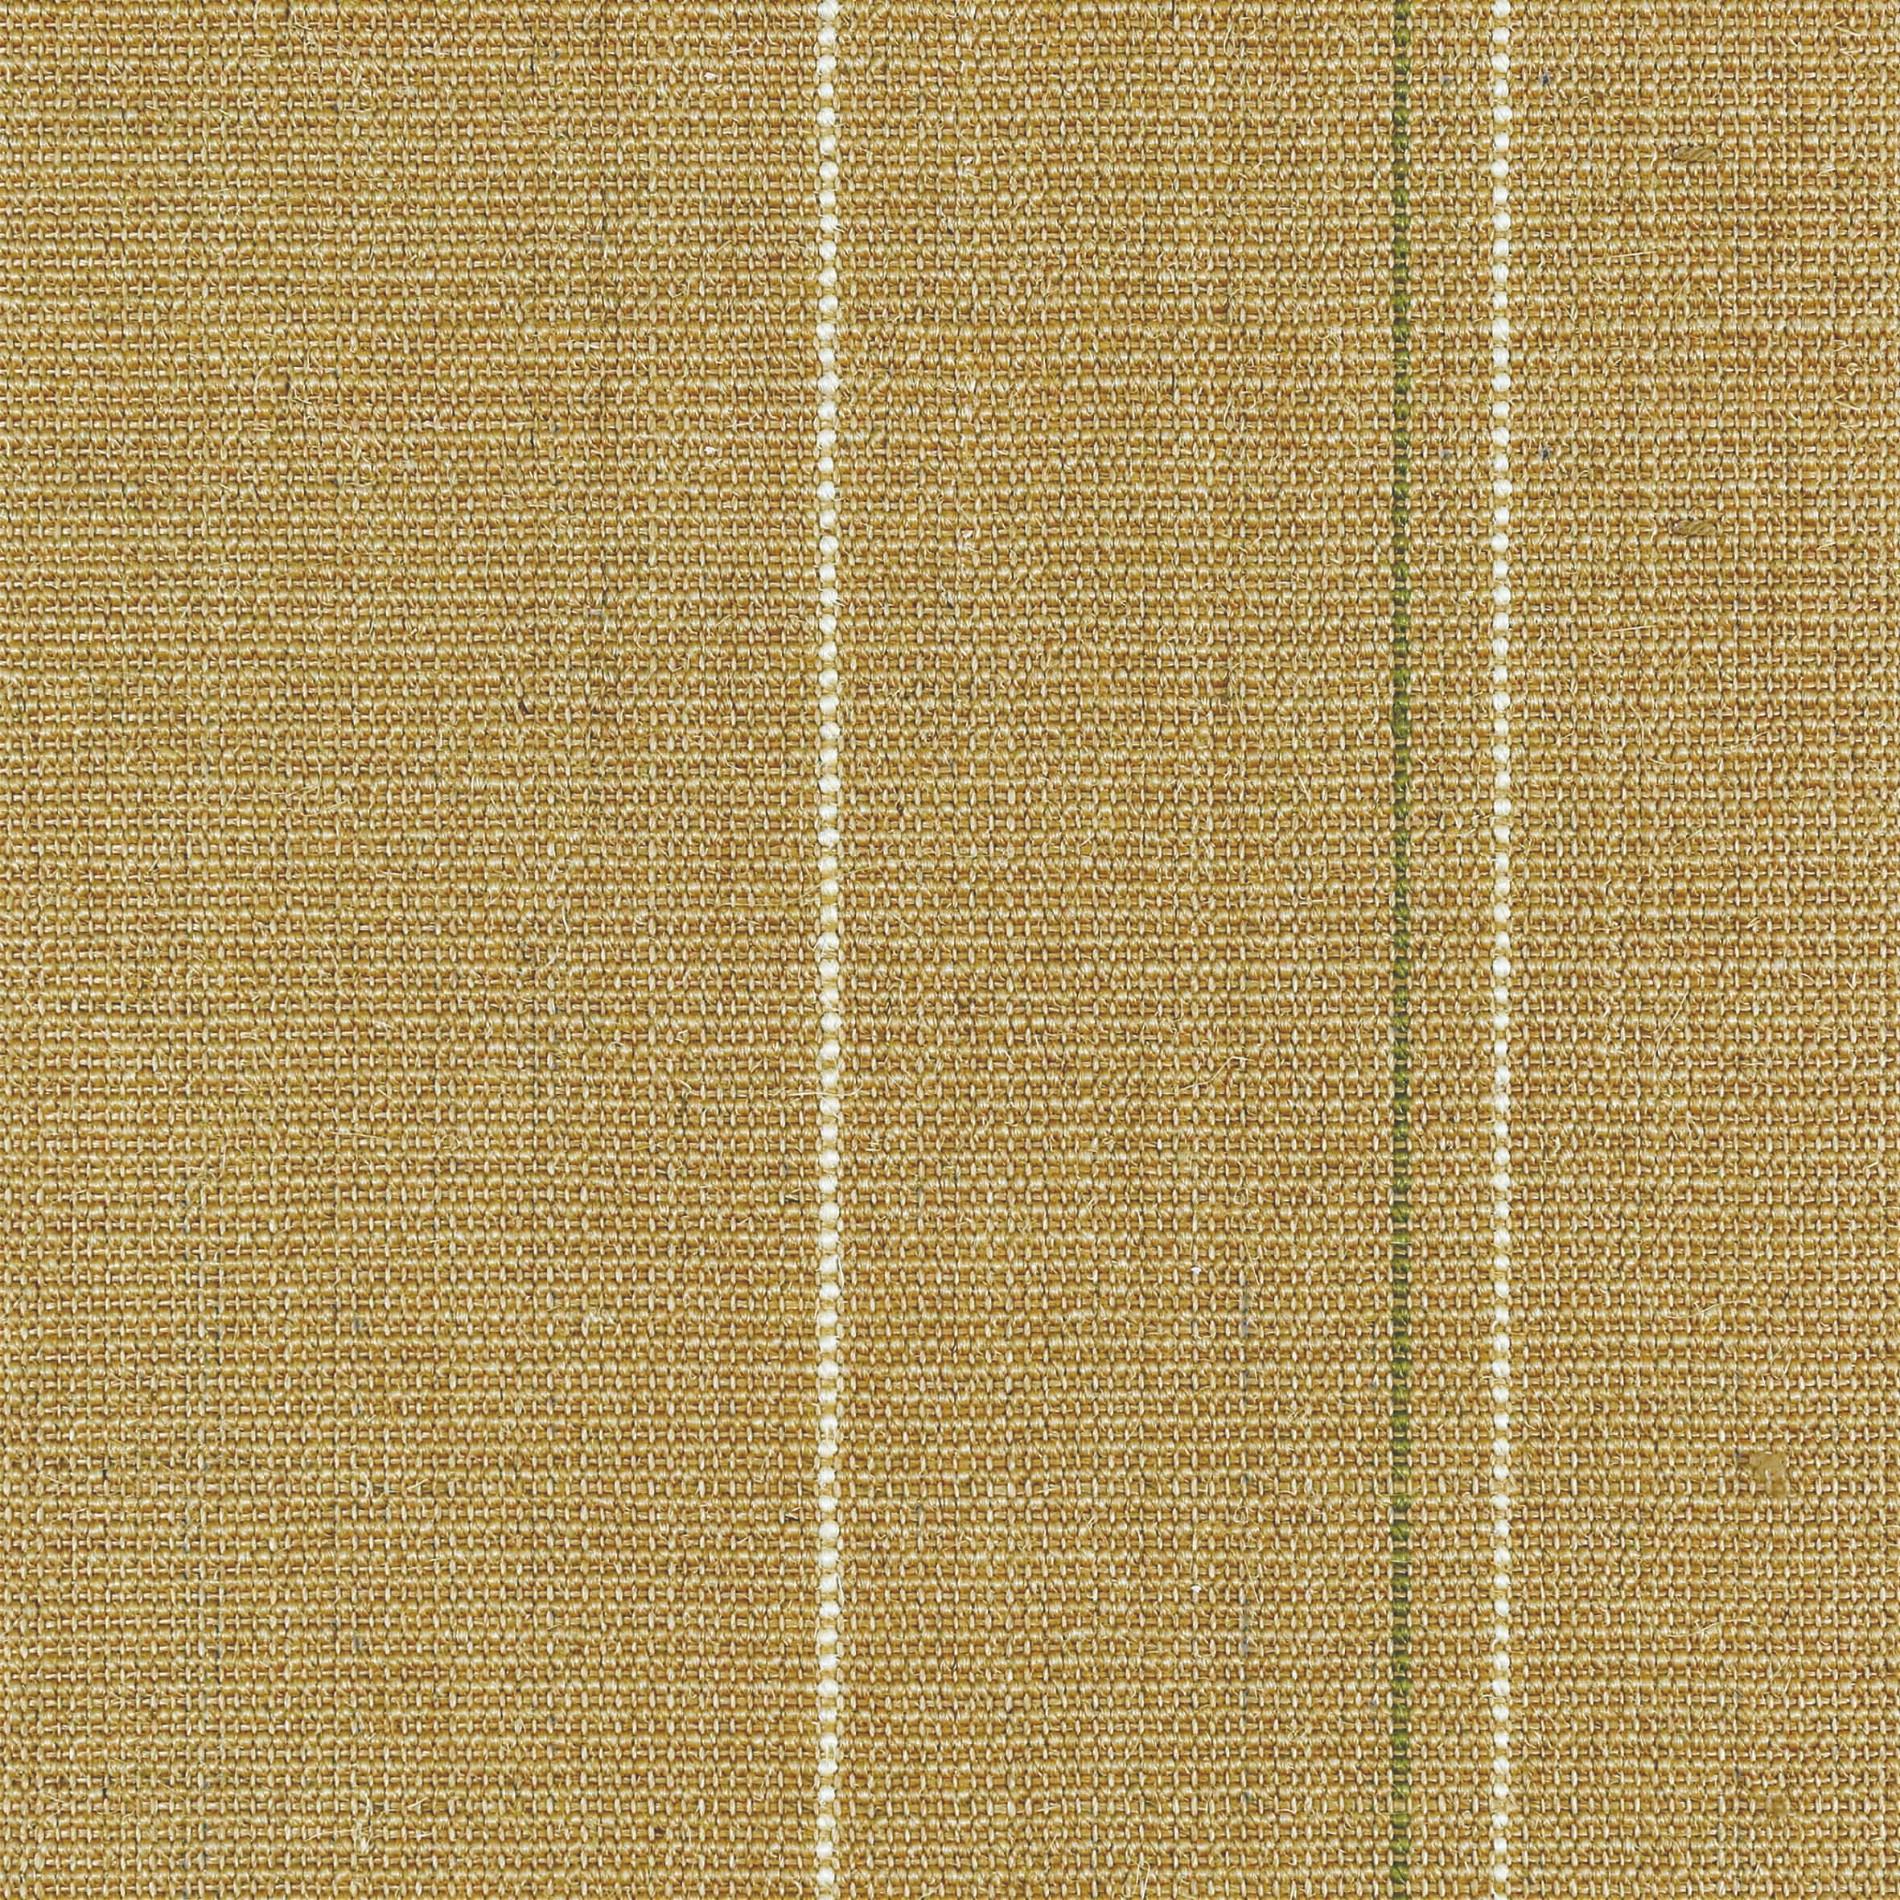 Sisal PVC Carpet Tiles Manufacturers, Sisal PVC Carpet Tiles Factory, Supply Sisal PVC Carpet Tiles